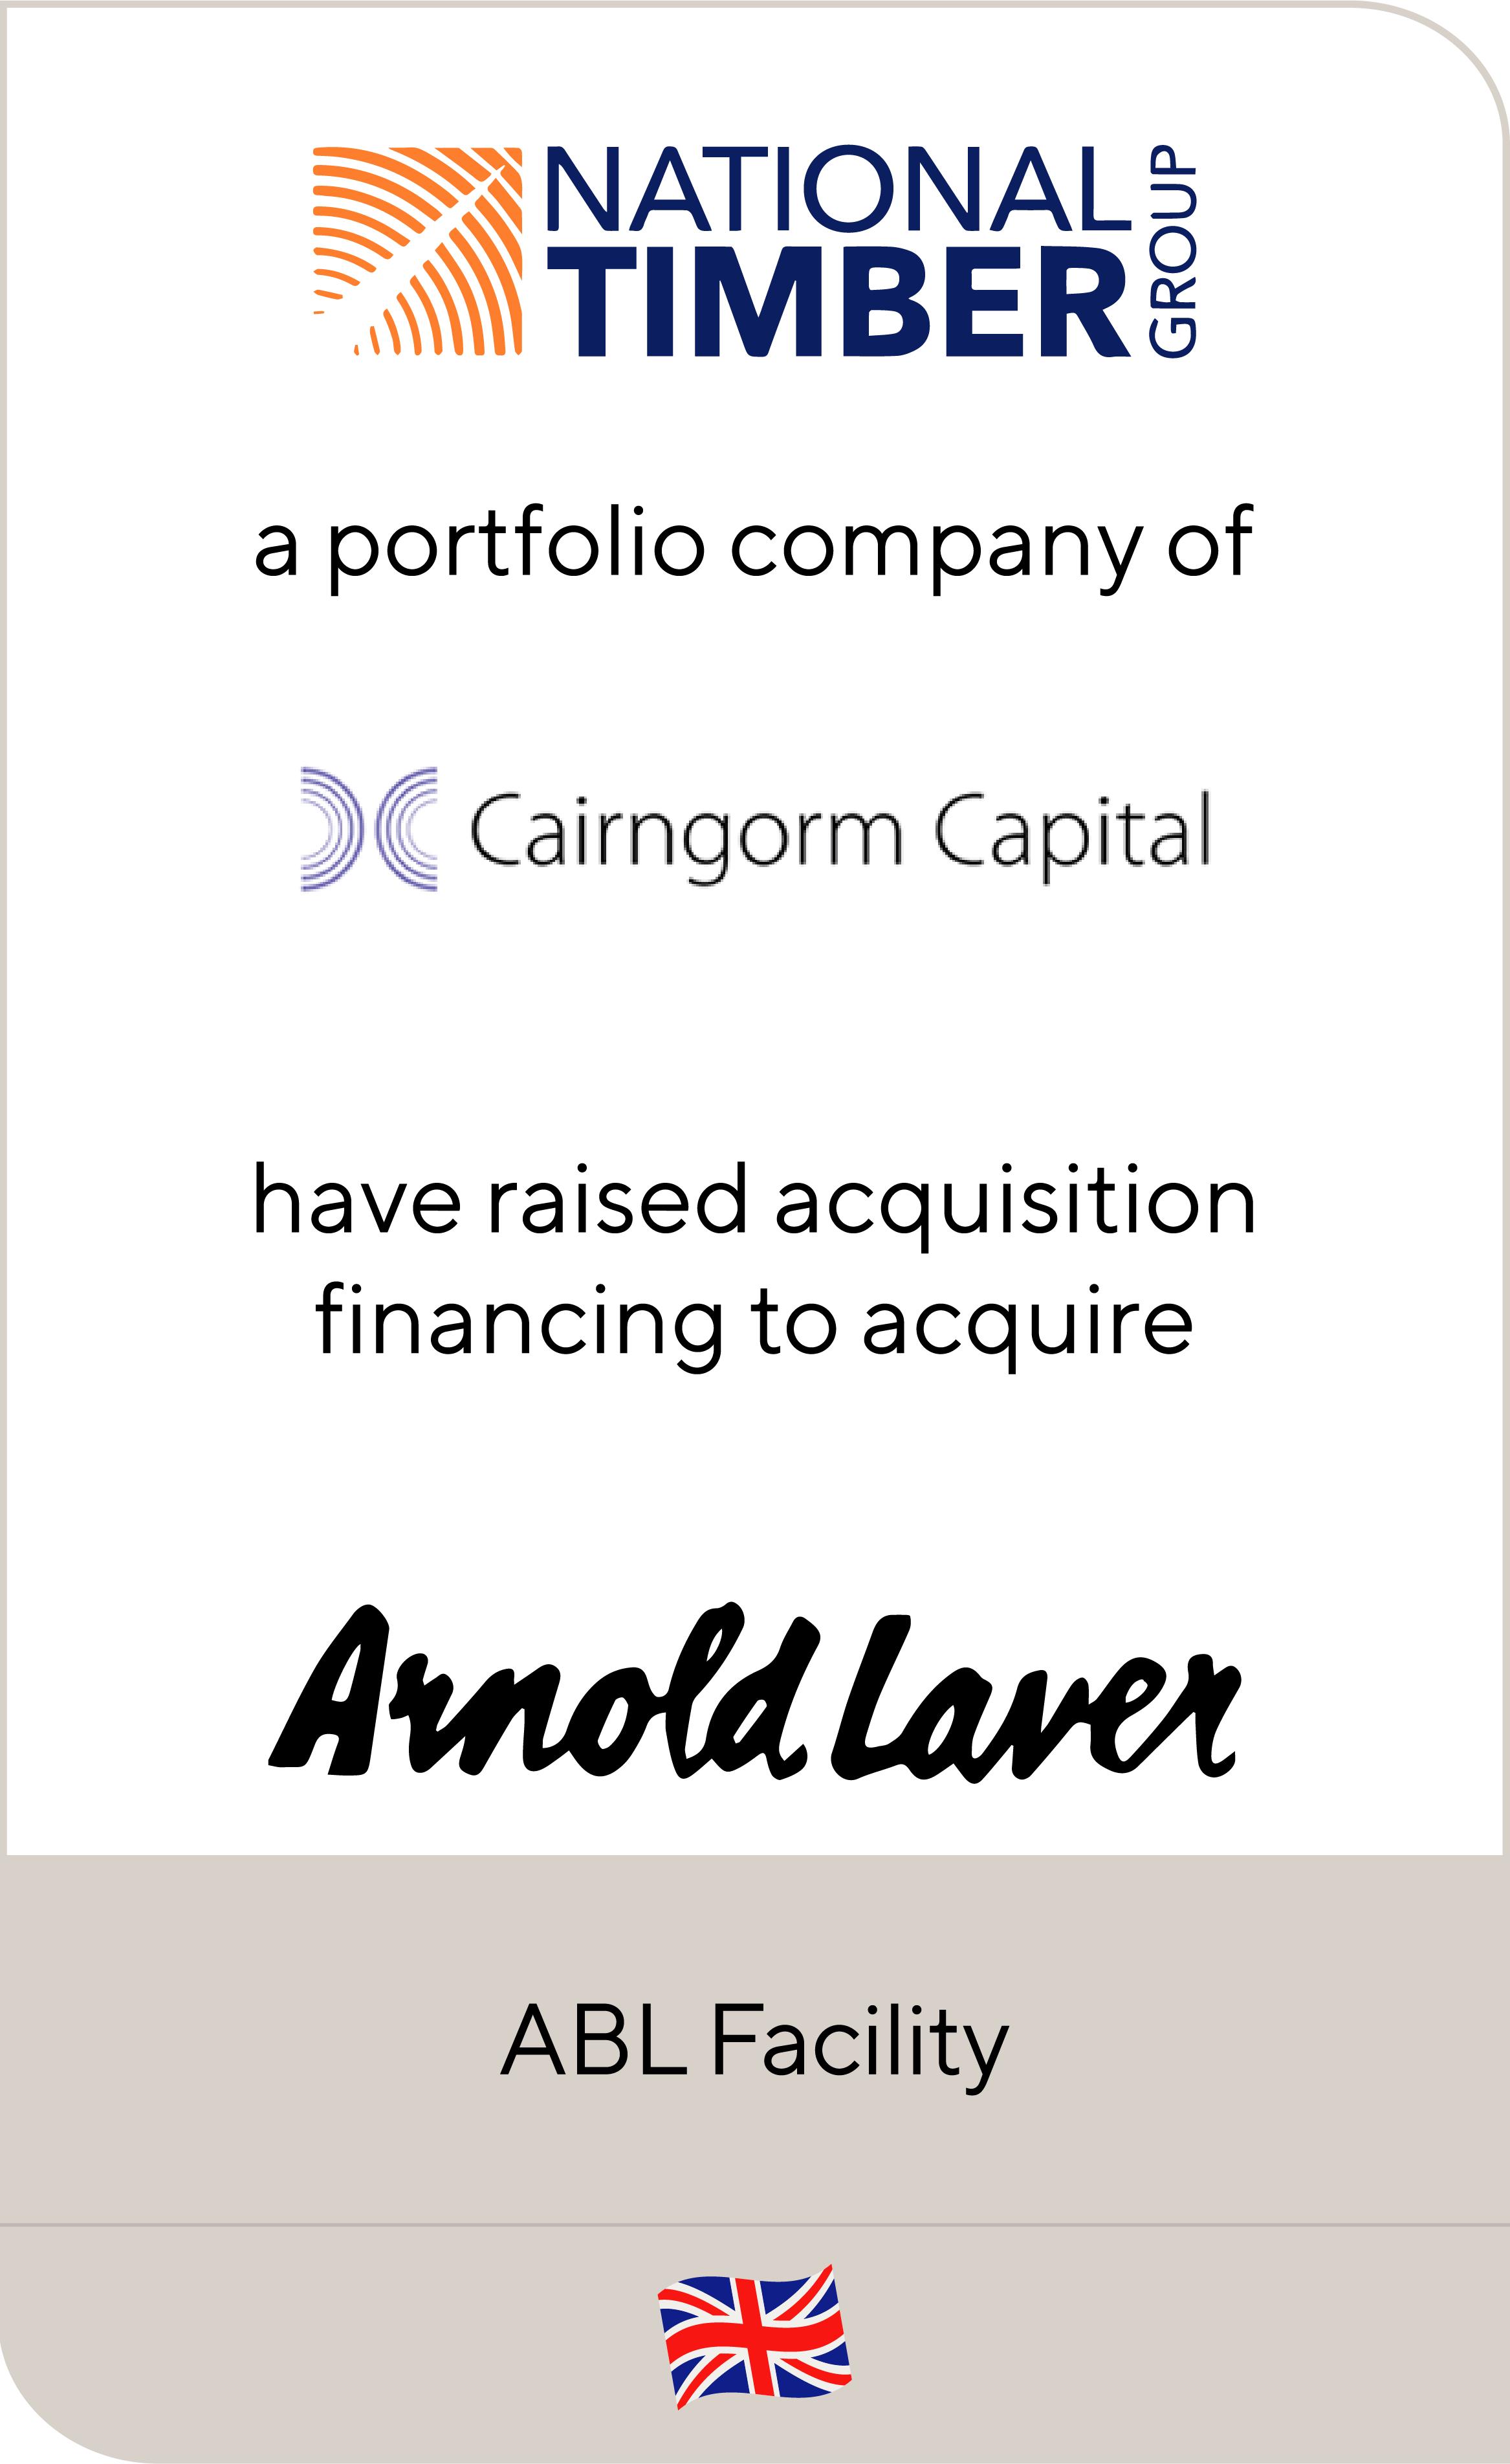 National Timber Grp Cairngorm Capital Arnold Laver 2017